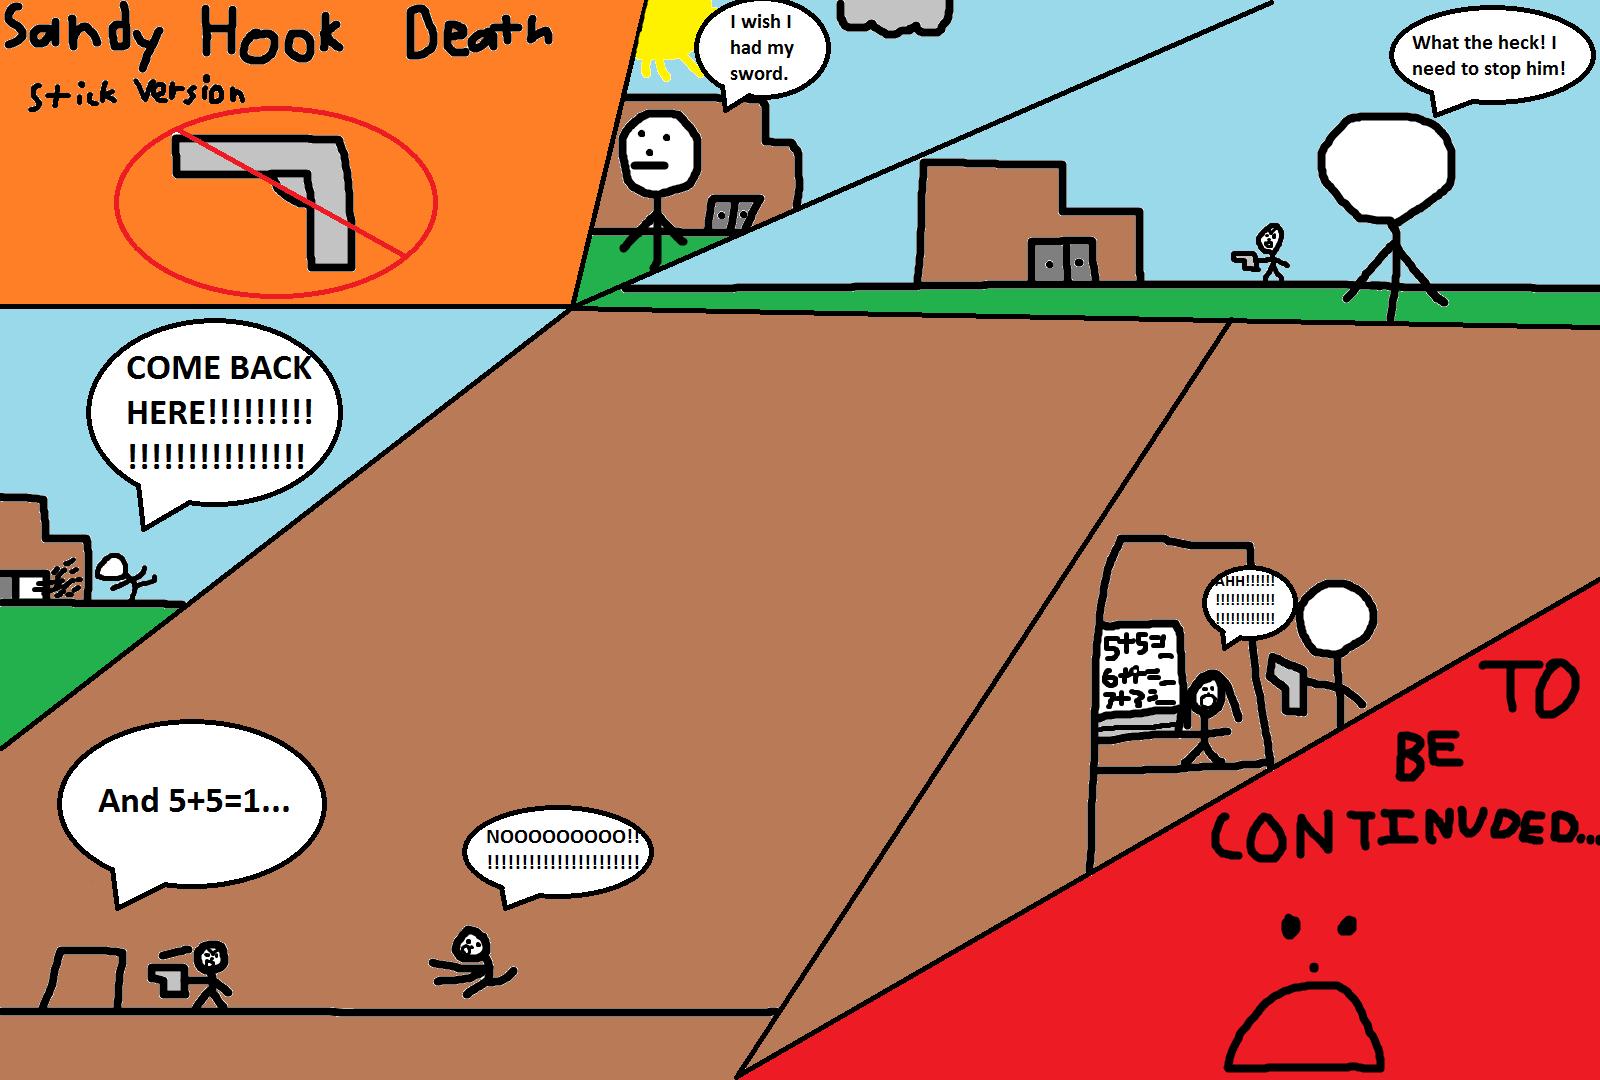 Sandy Hook Death 1